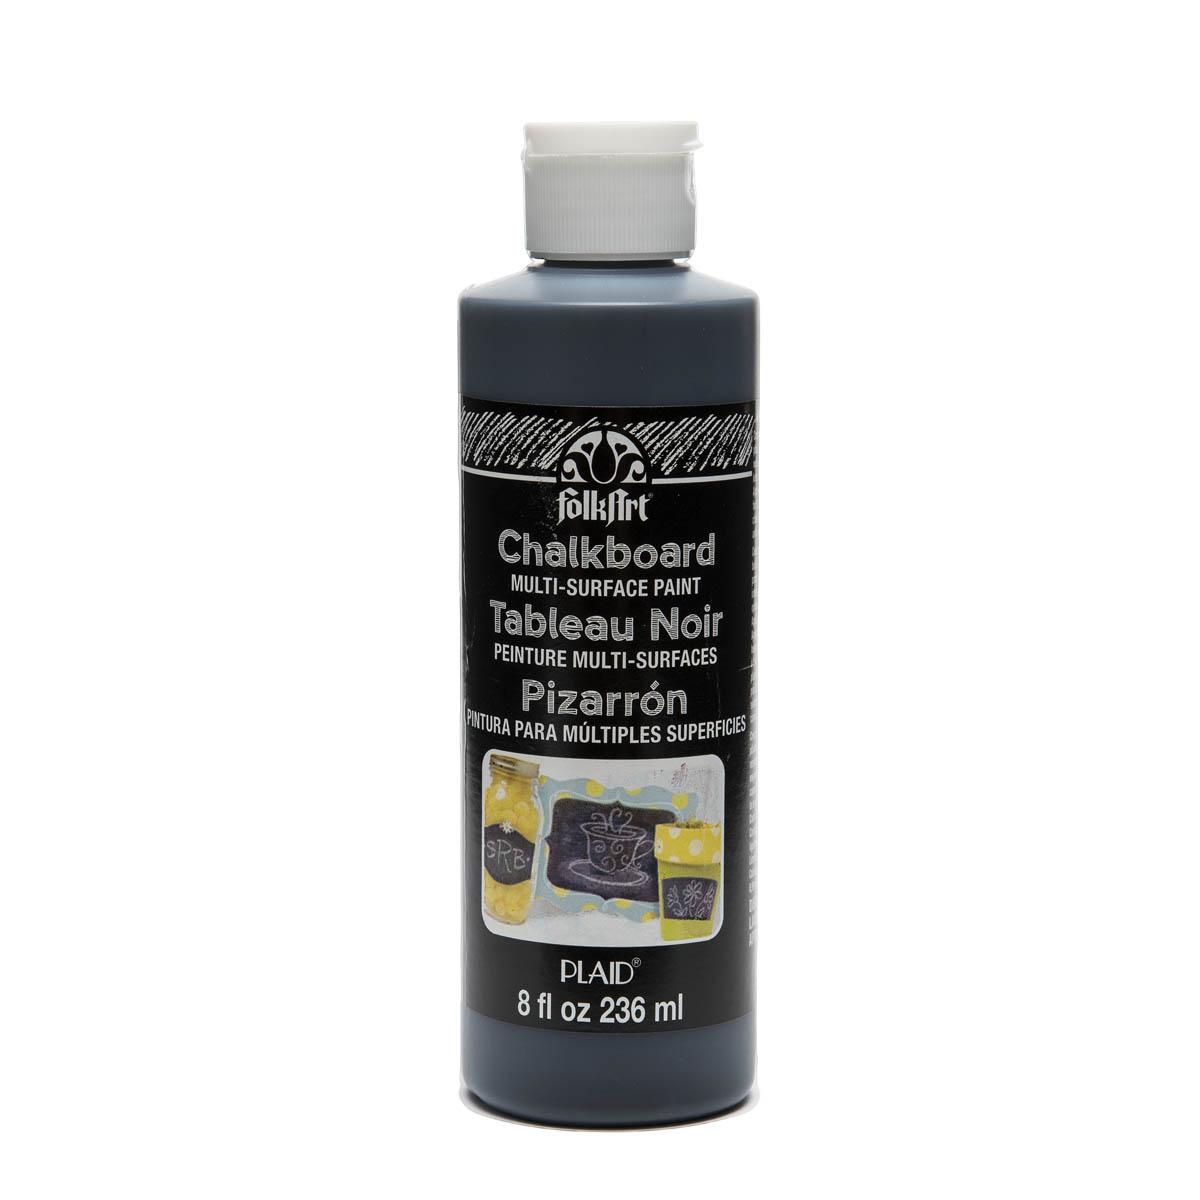 FolkArt ® Chalkboard Multi-Surface Paint - Black, 8 oz. - 2651